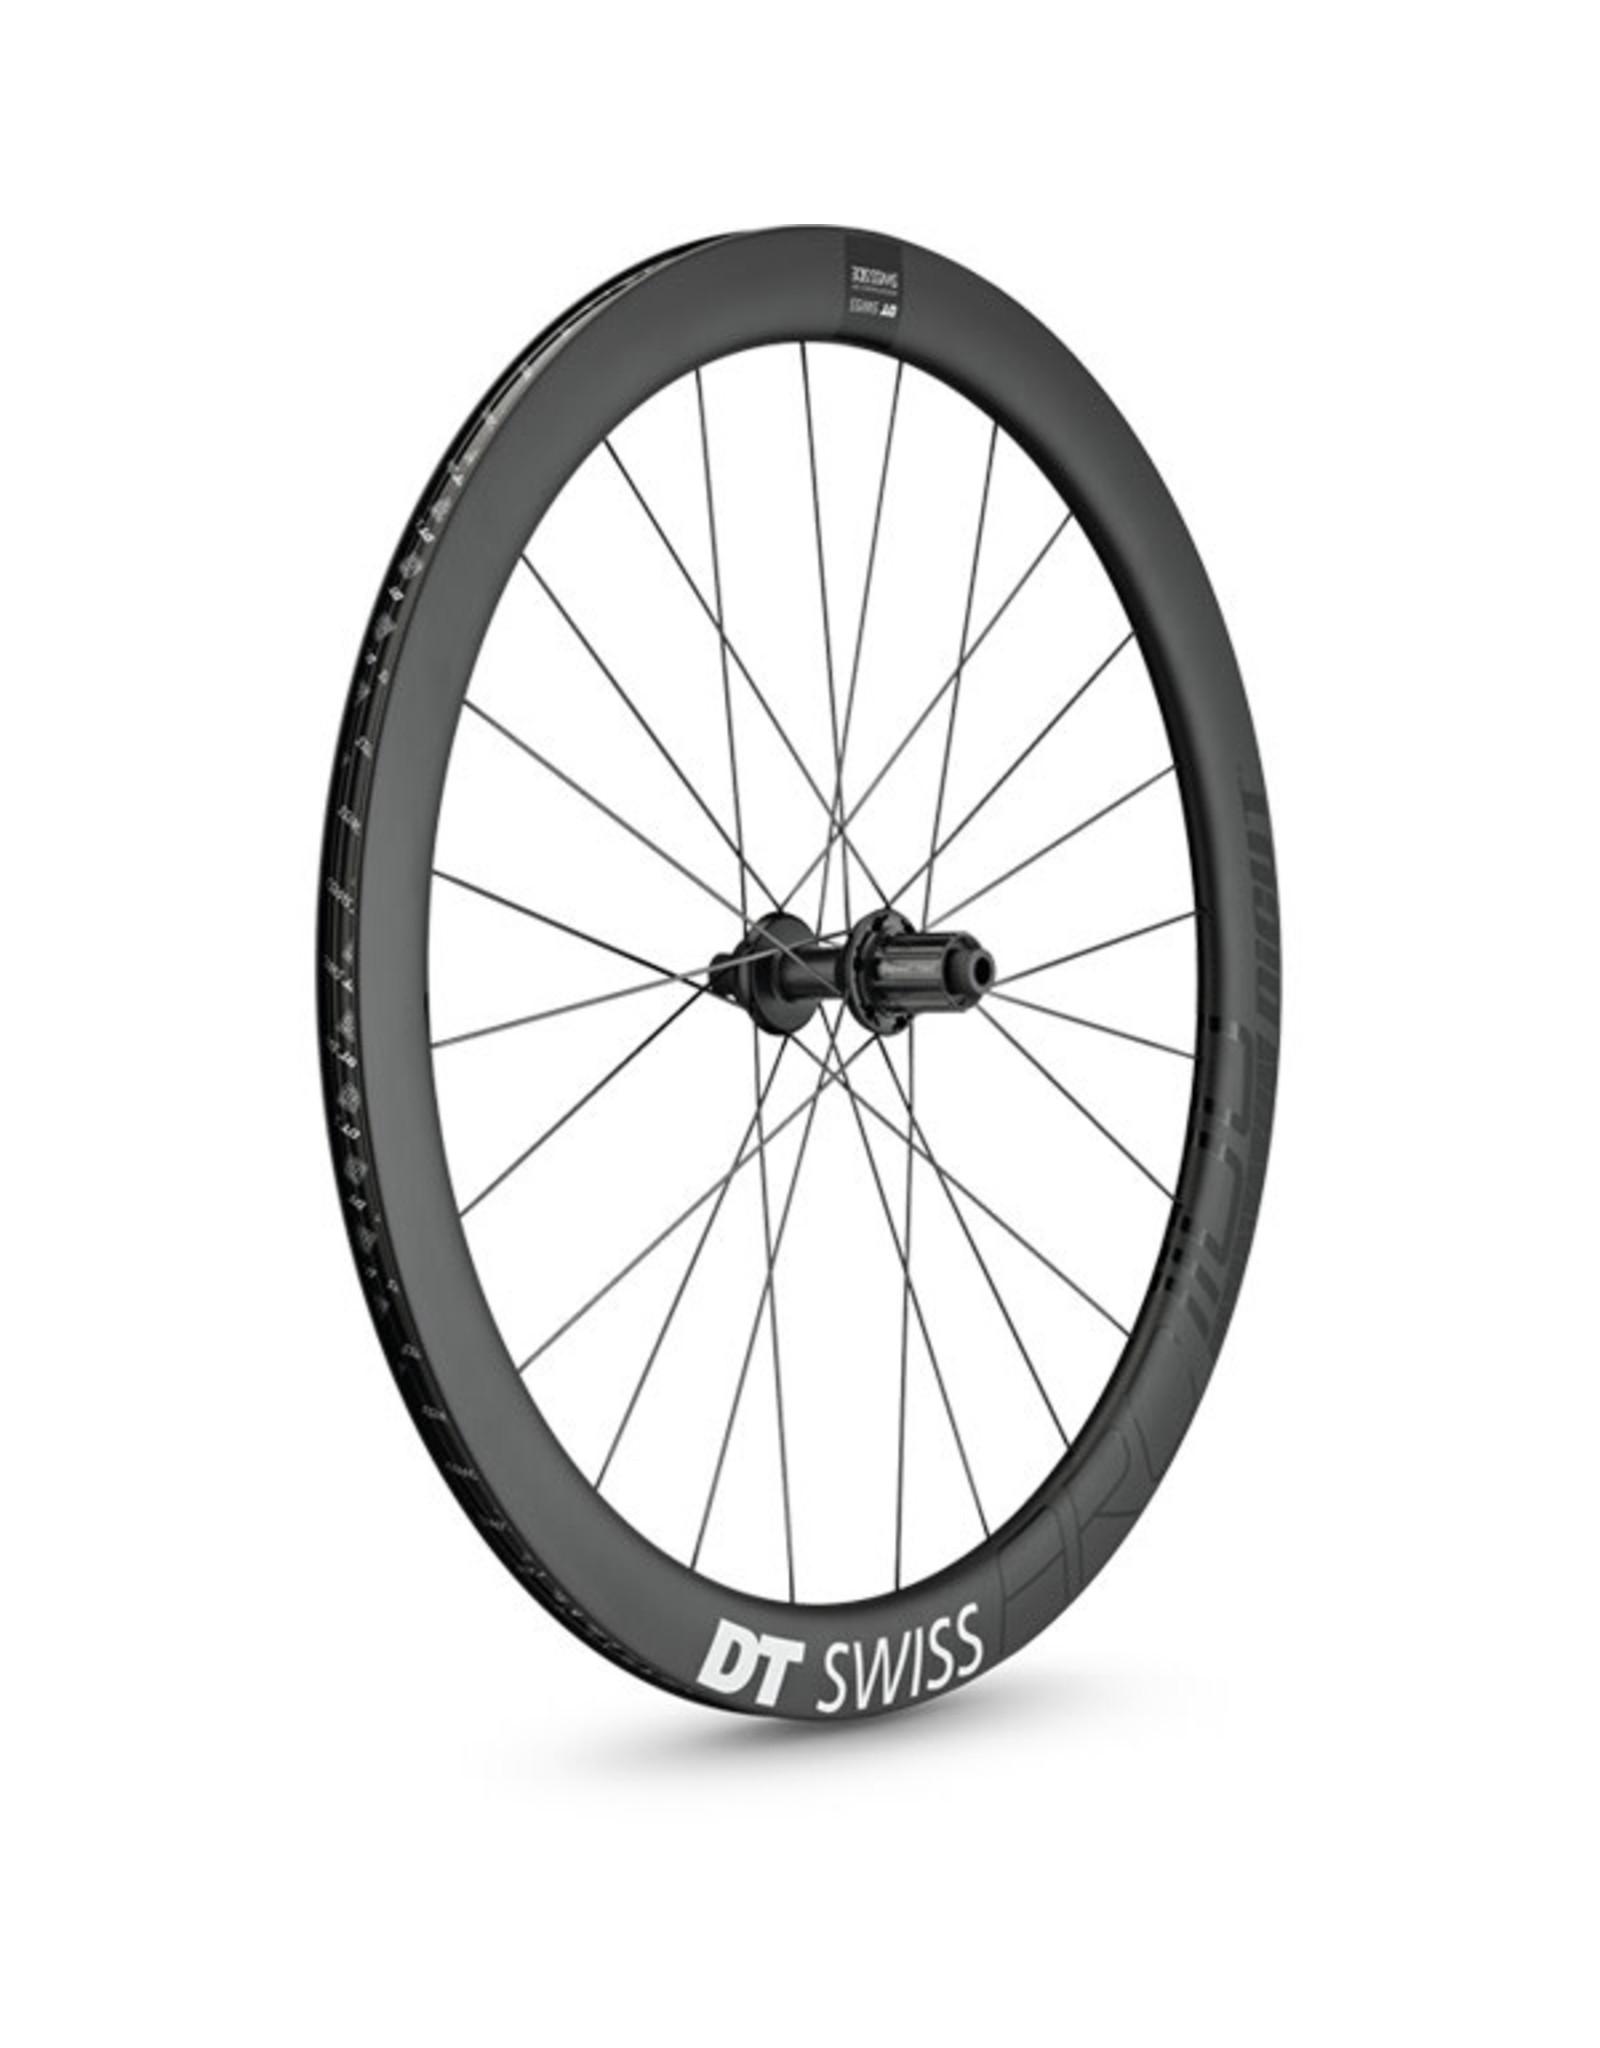 DT Swiss Wheel Disc Brake ARC 1100 48mm